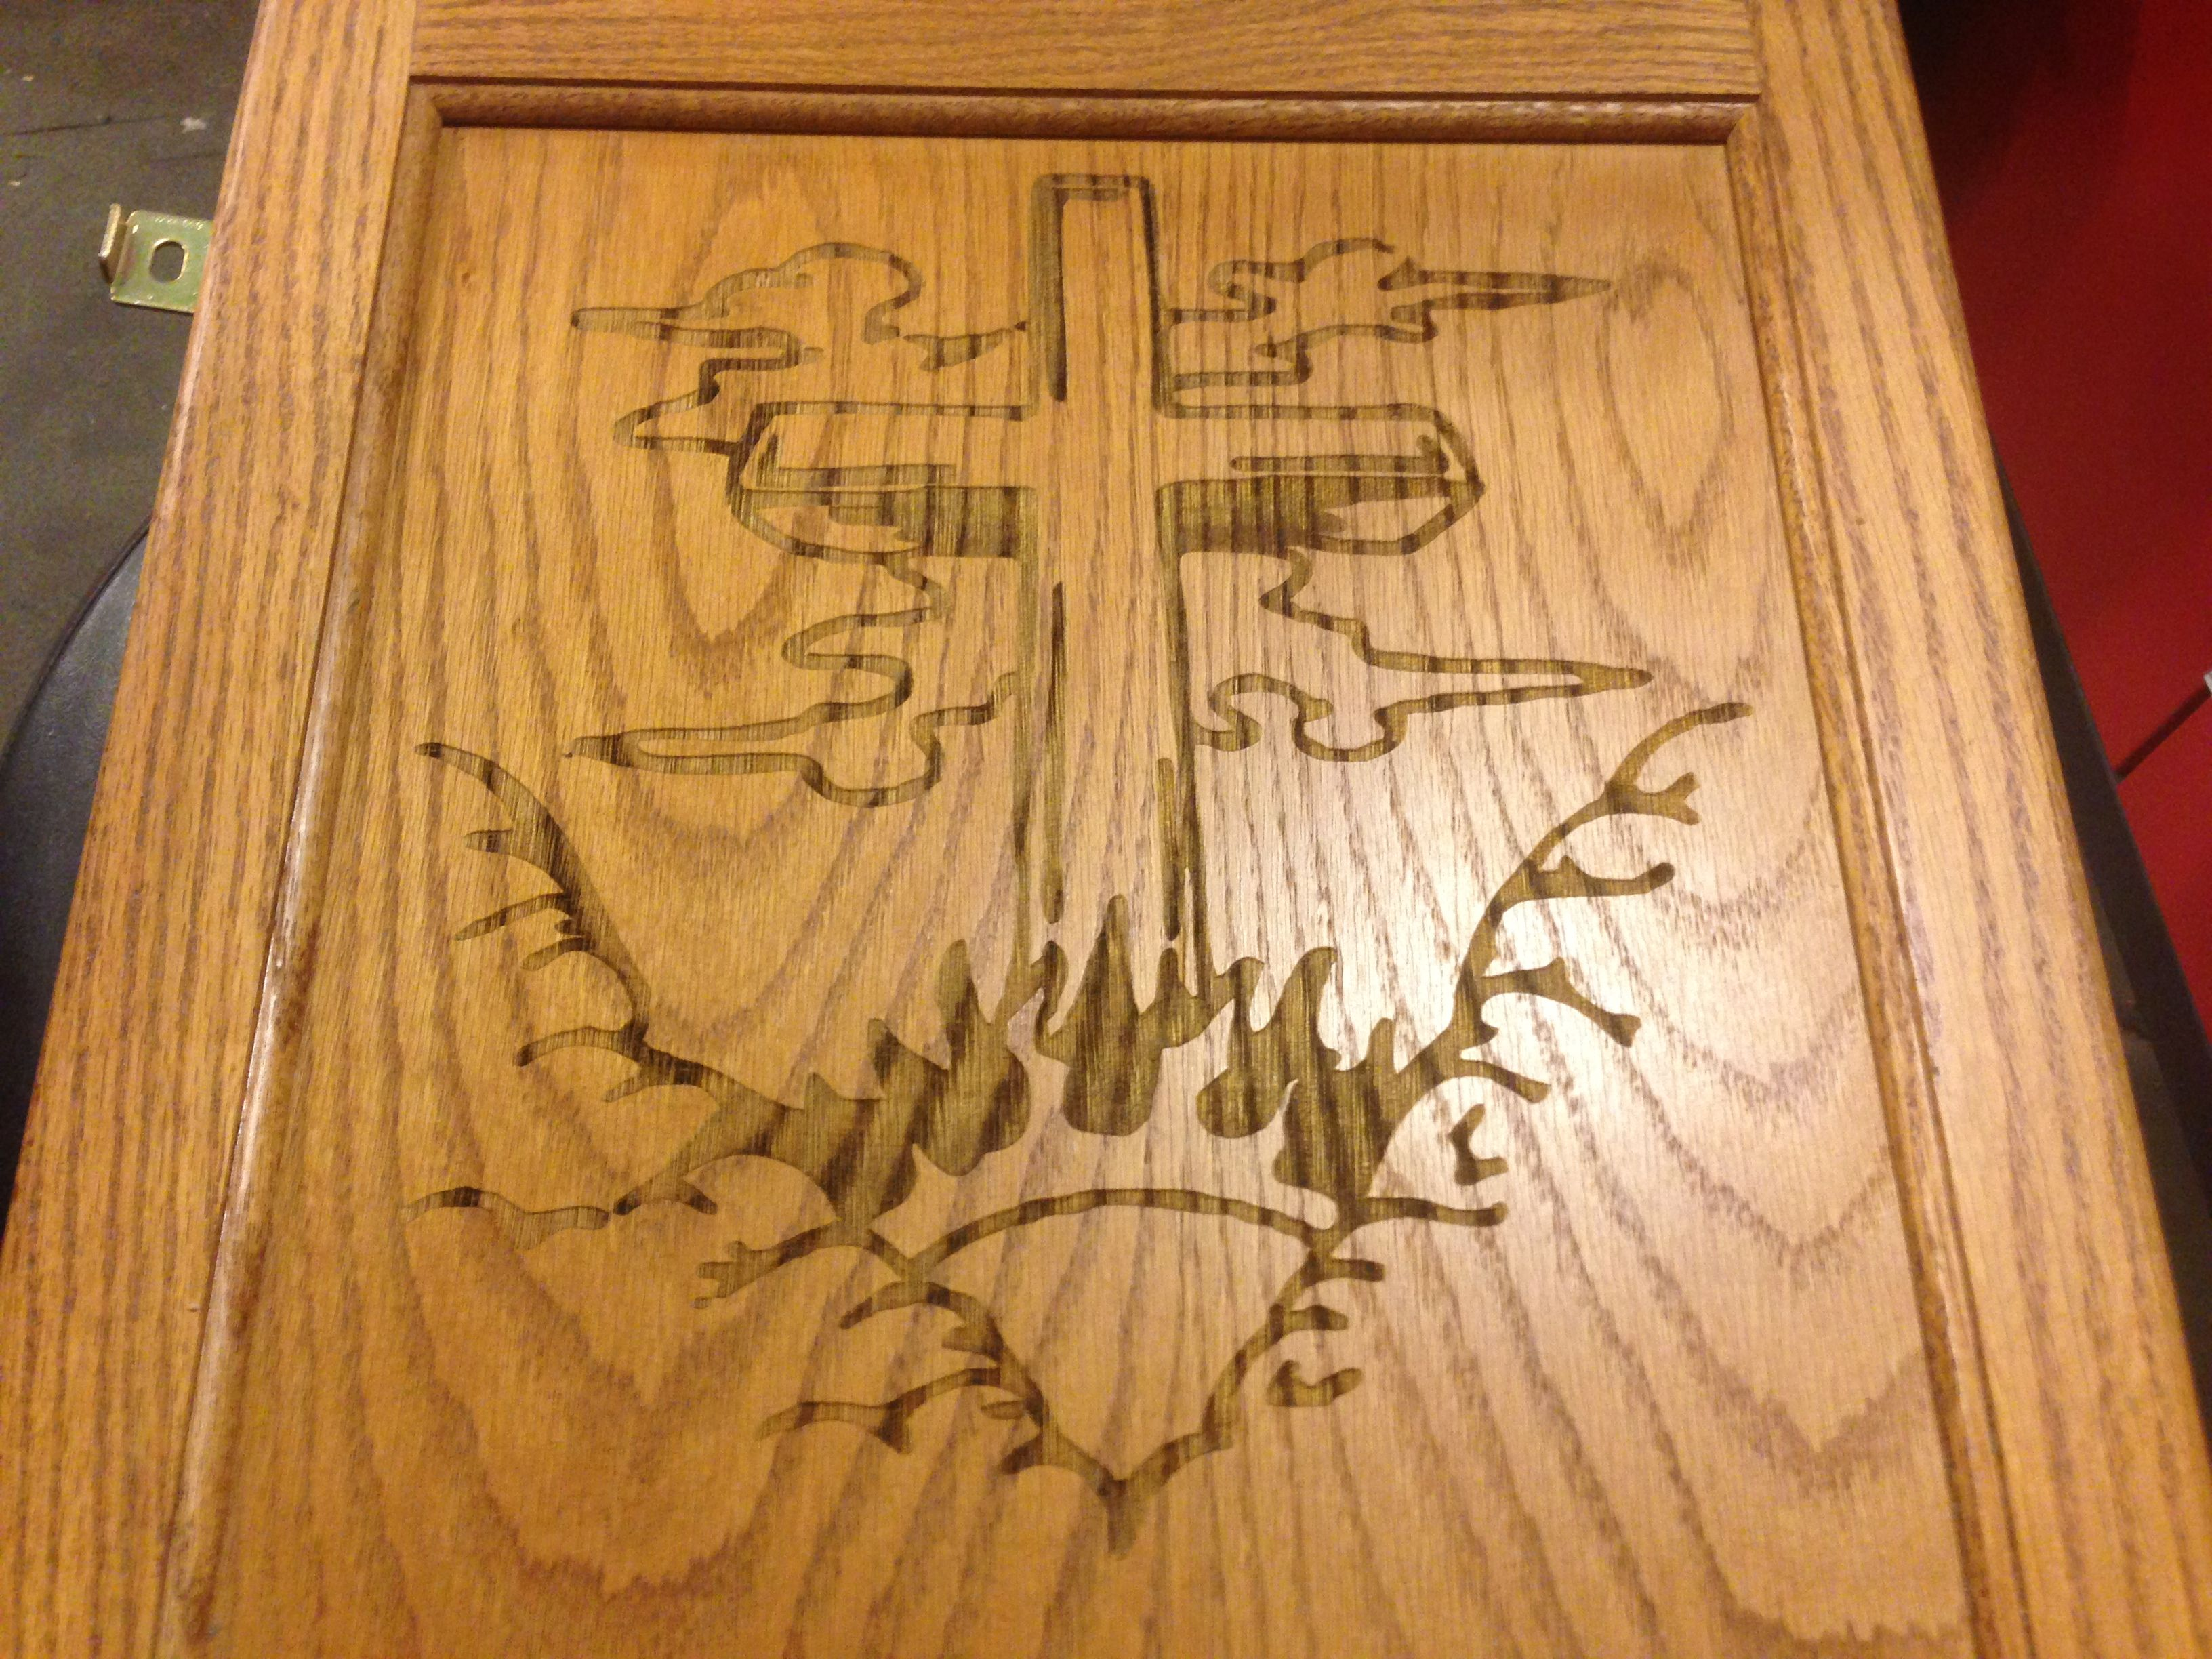 laser engraved on wood cabinet door